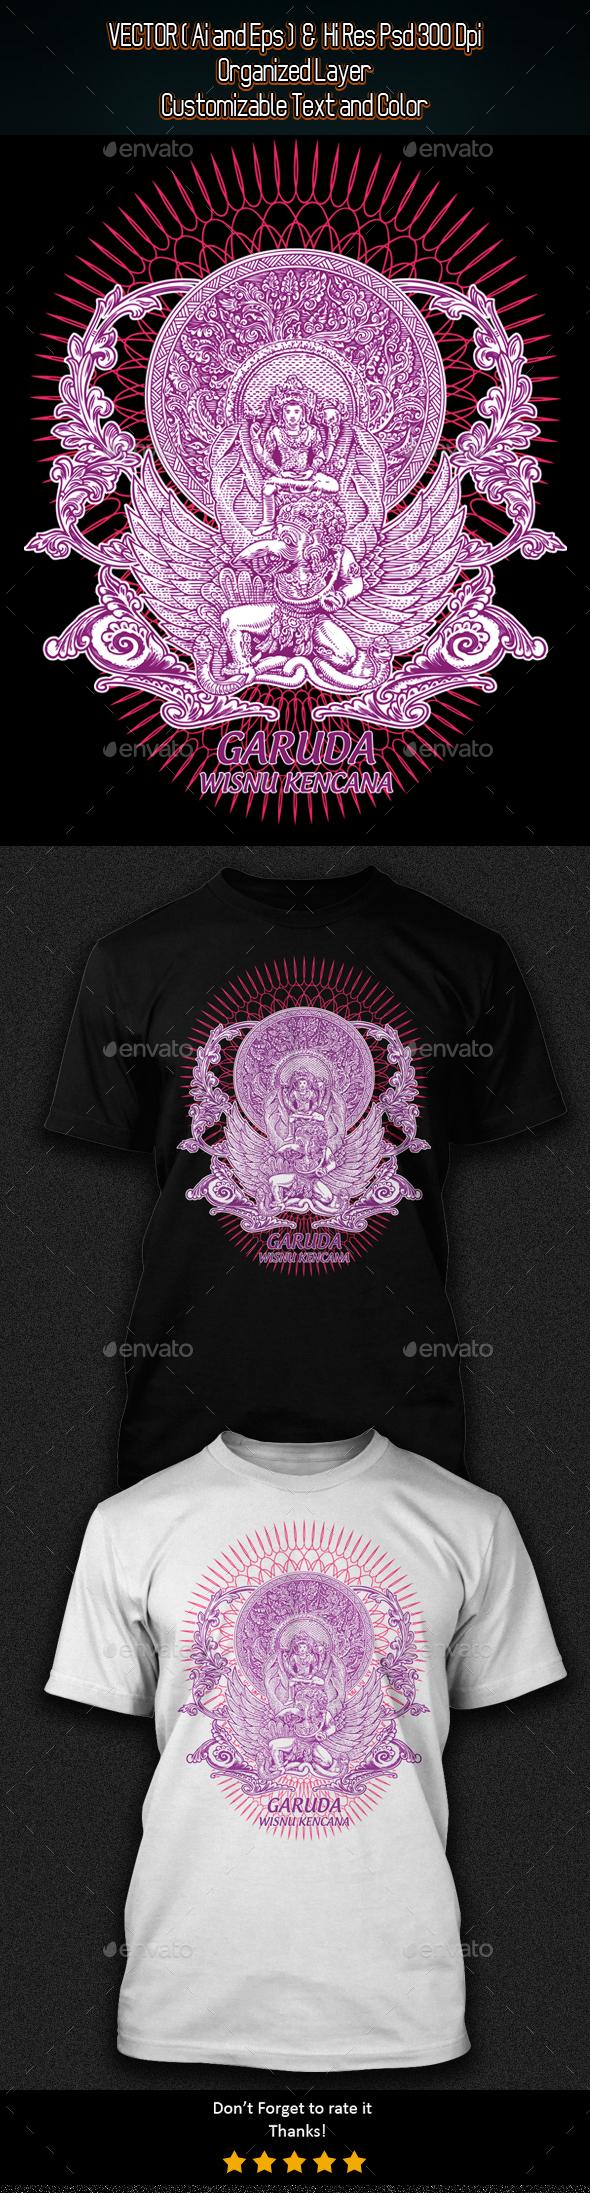 Garuda Wisnu Kencana - Grunge Designs